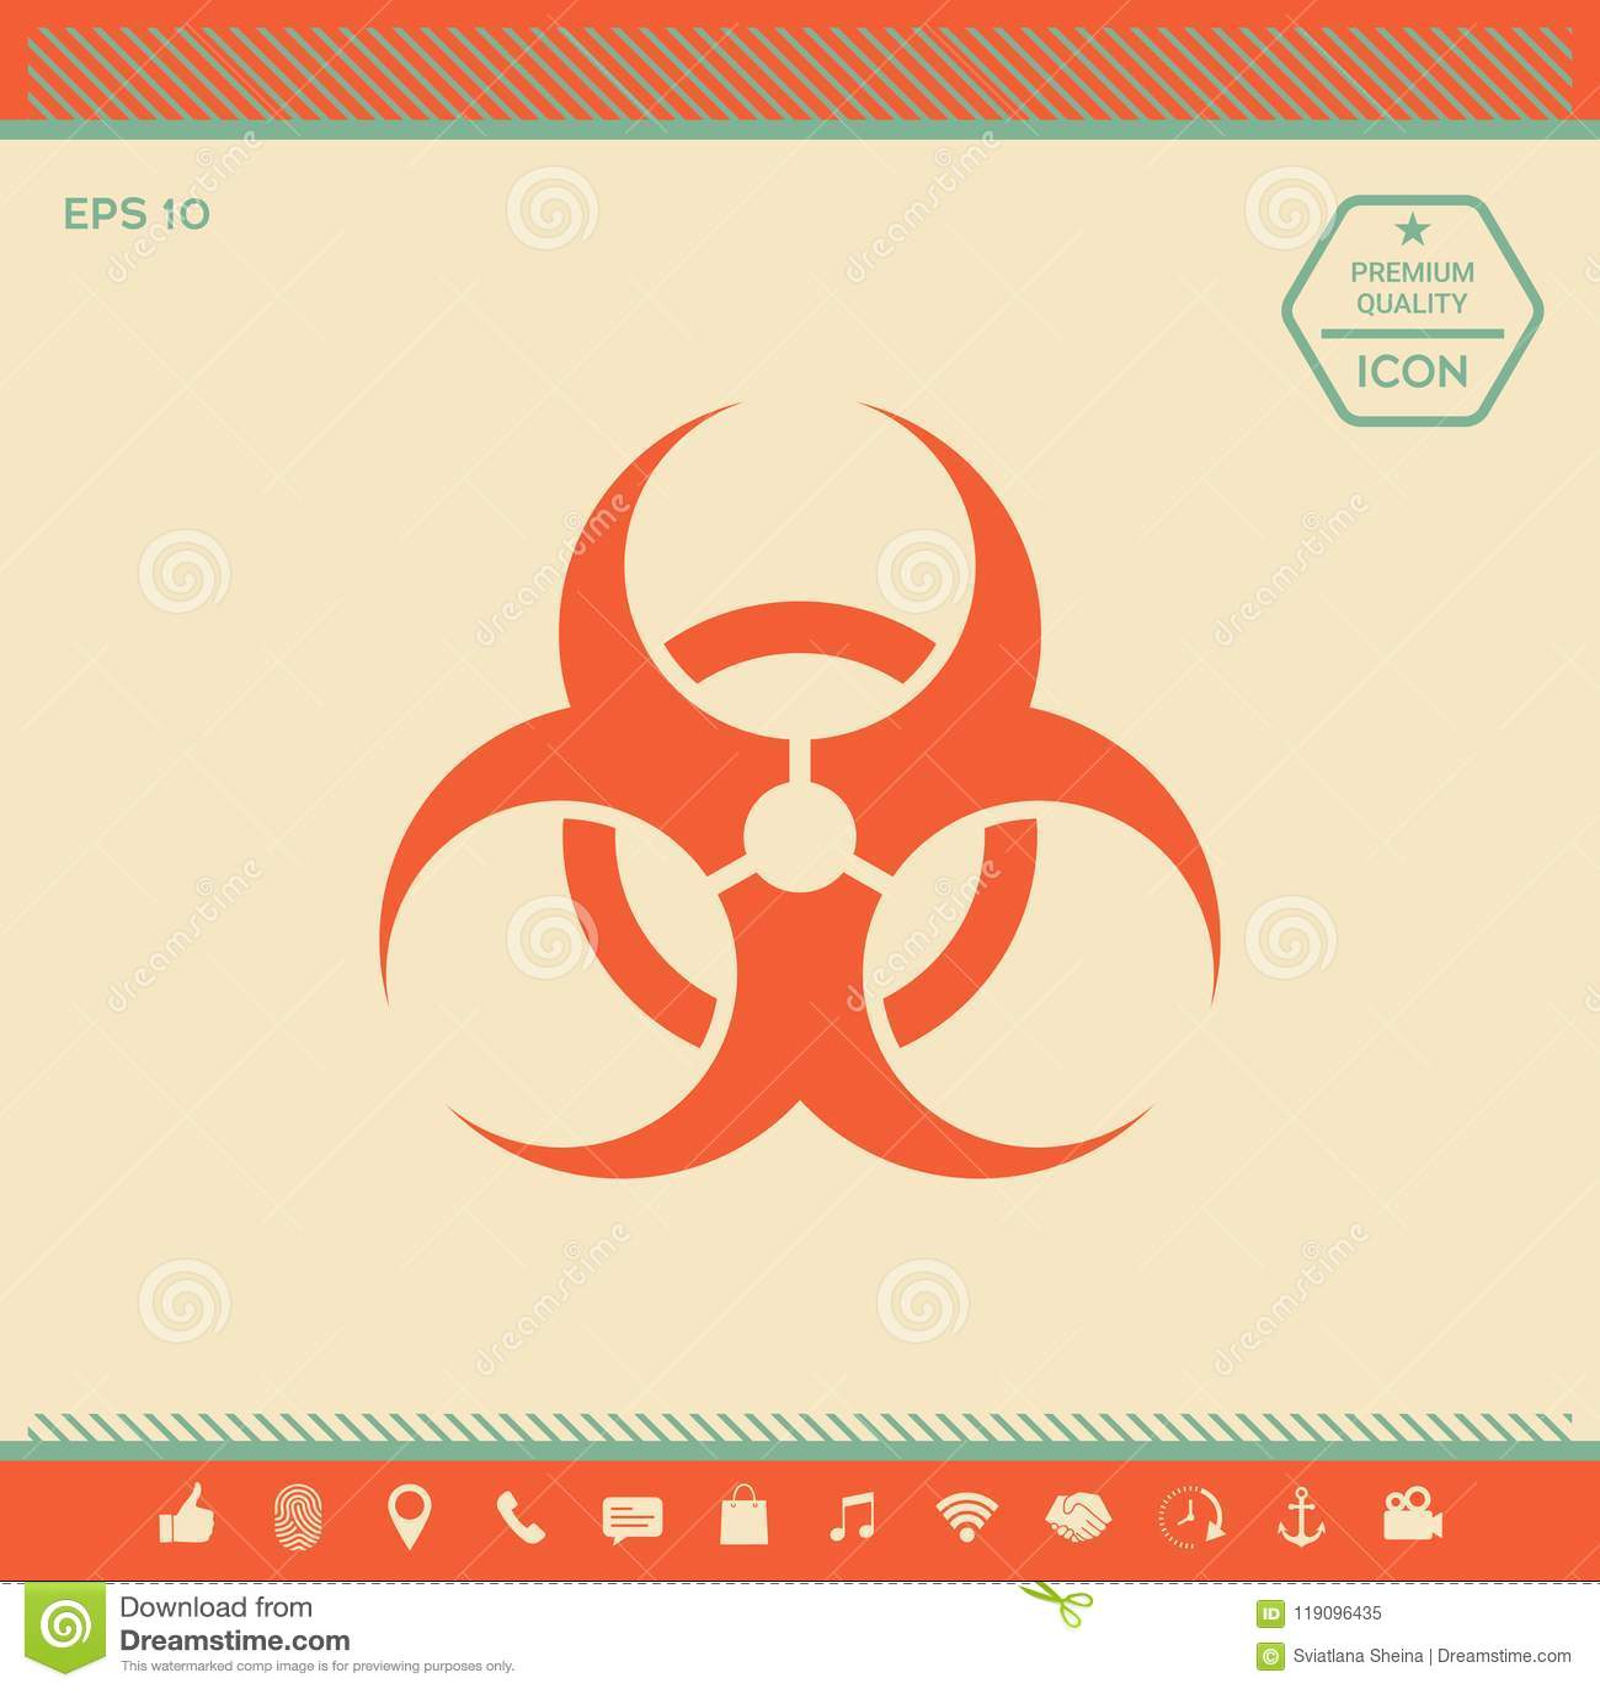 Biological Hazard Sign Stock Vector Illustration Of Poison 119096435